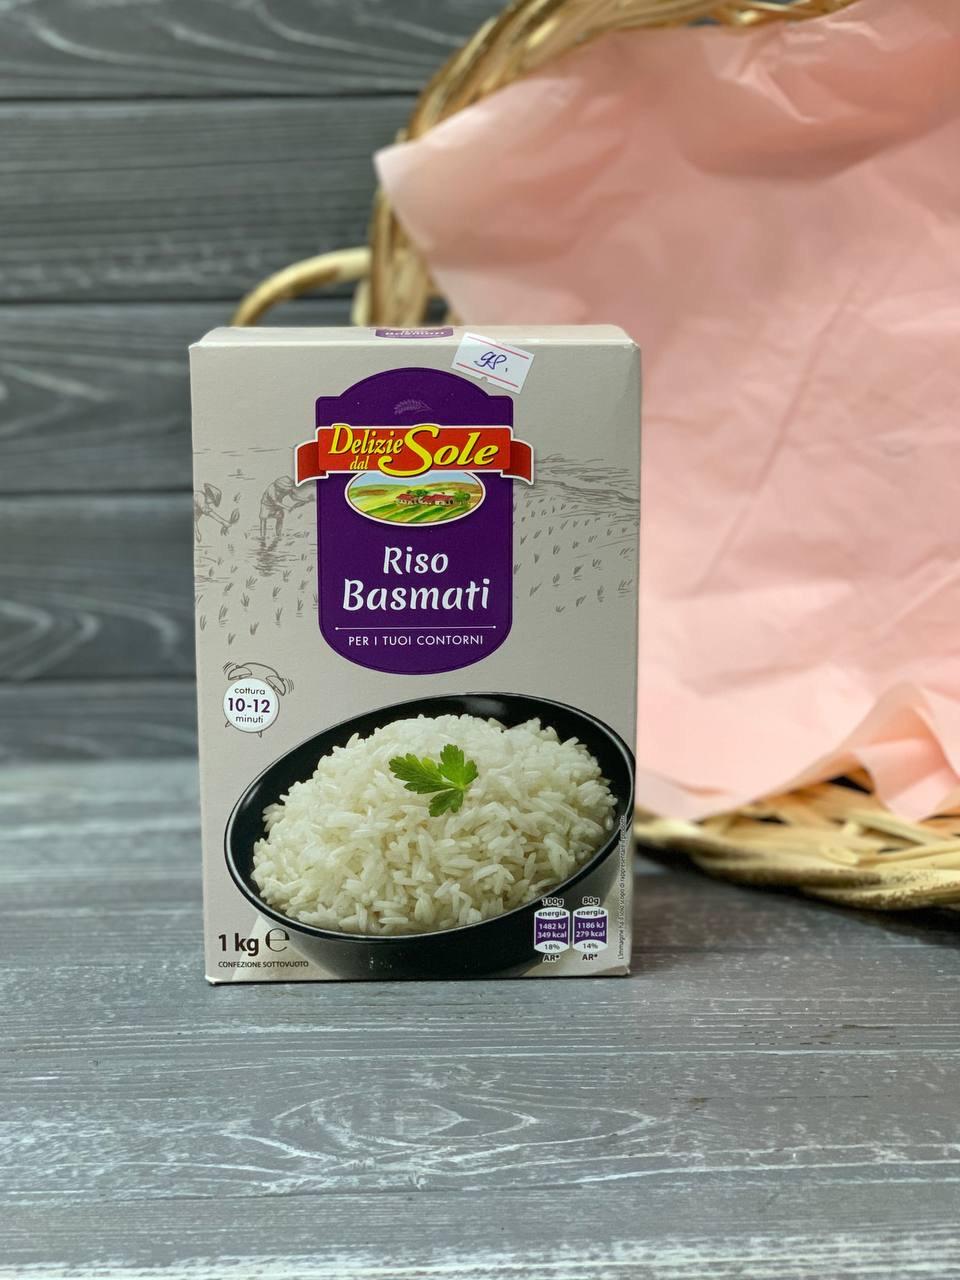 Рис Басматі Riso Basmati Delizie dal Sole 1 kg